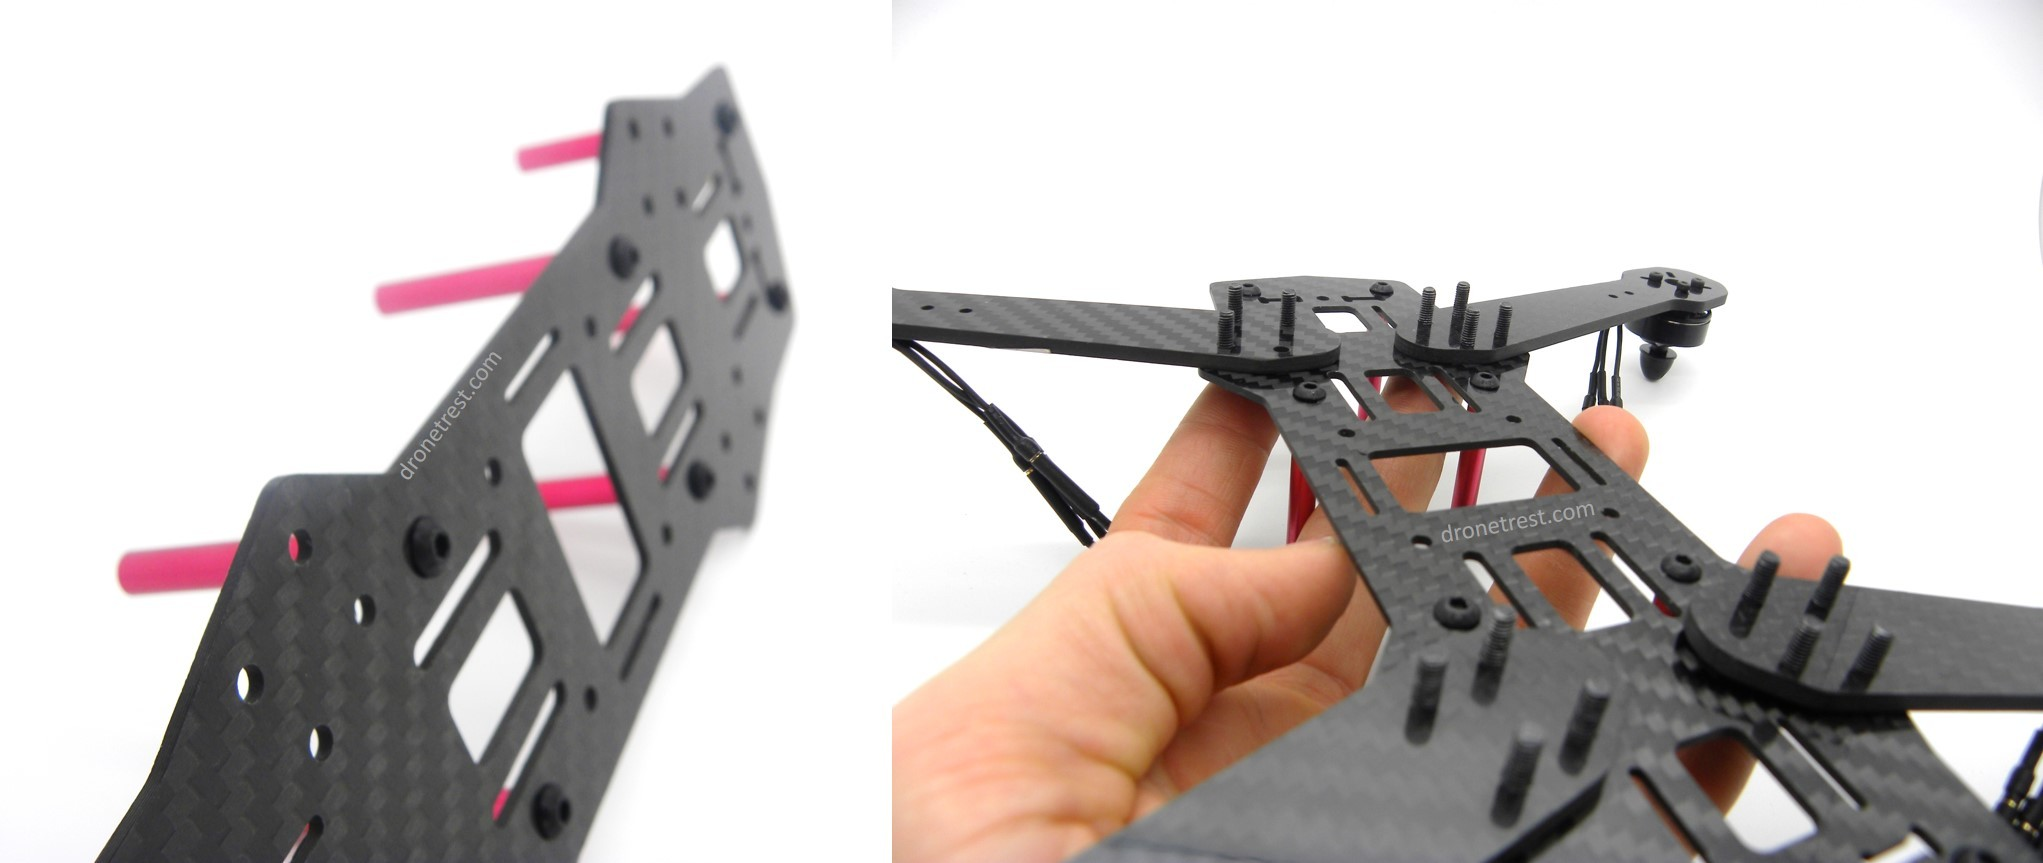 QAV ZMR 250 Assembly Build Guide - Guides - DroneTrest